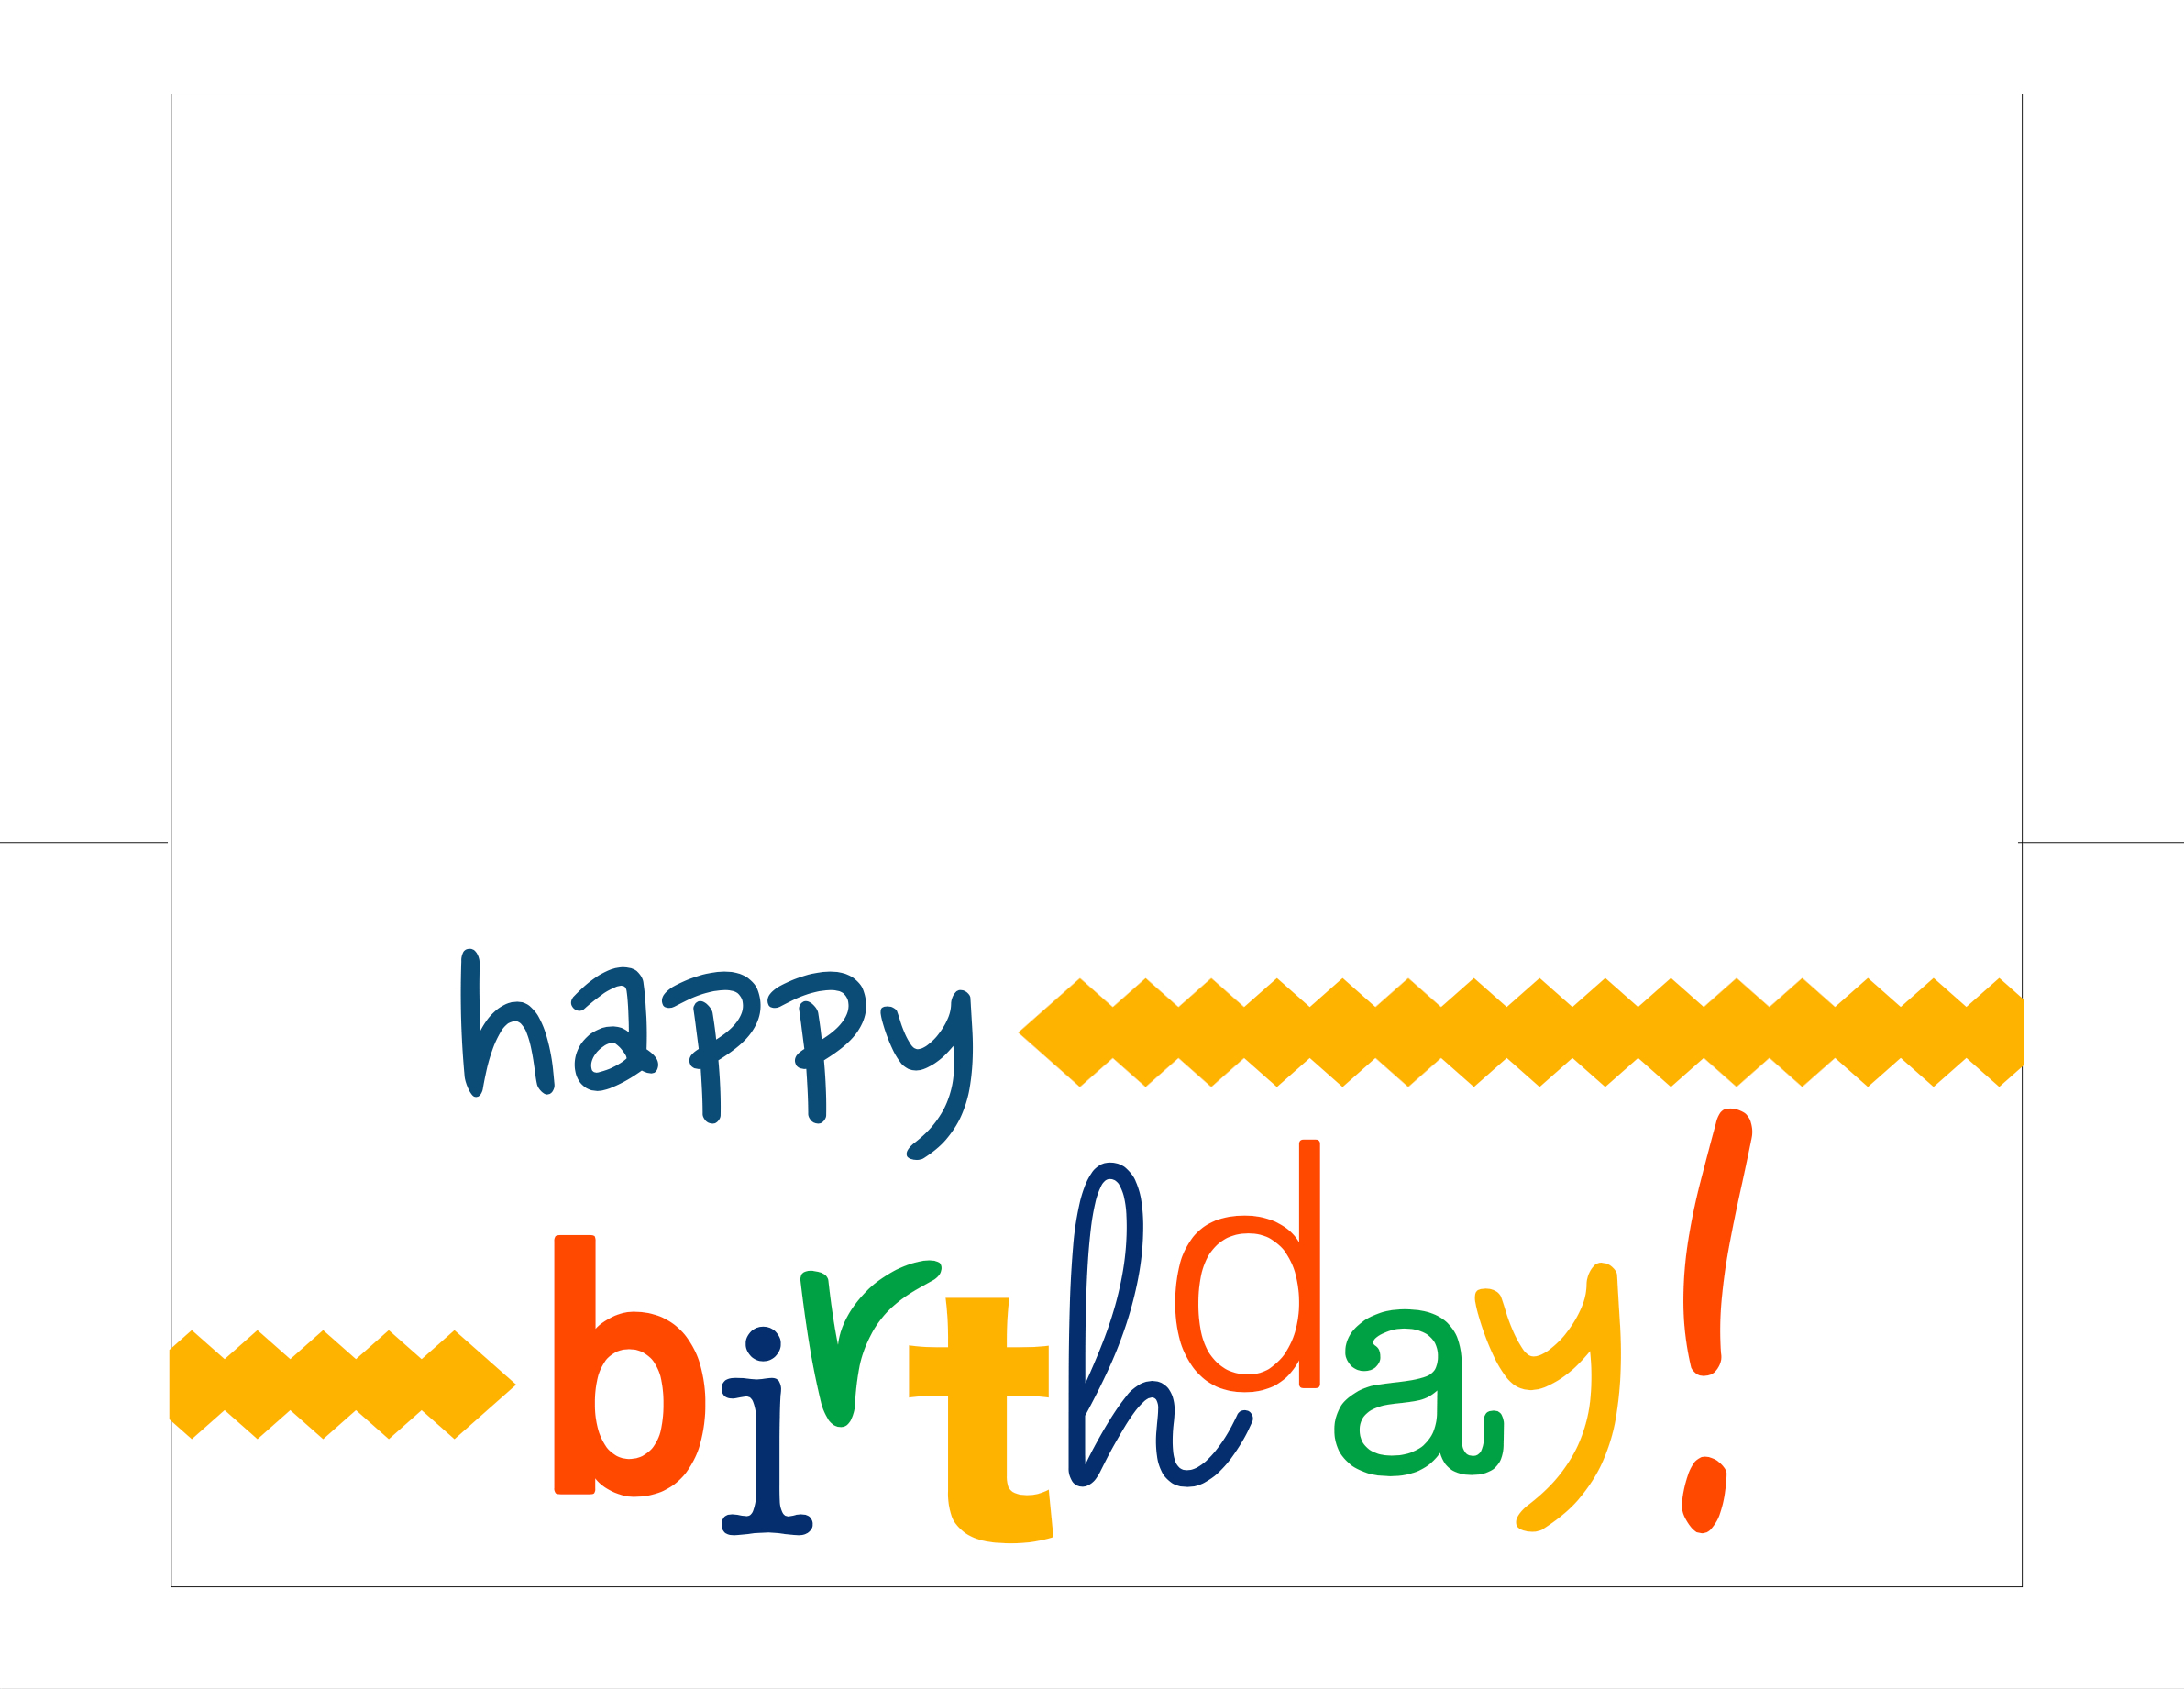 Happy Birthday Card Free Printable - How Do The Jones Do It - Happy Birthday Free Cards Printable